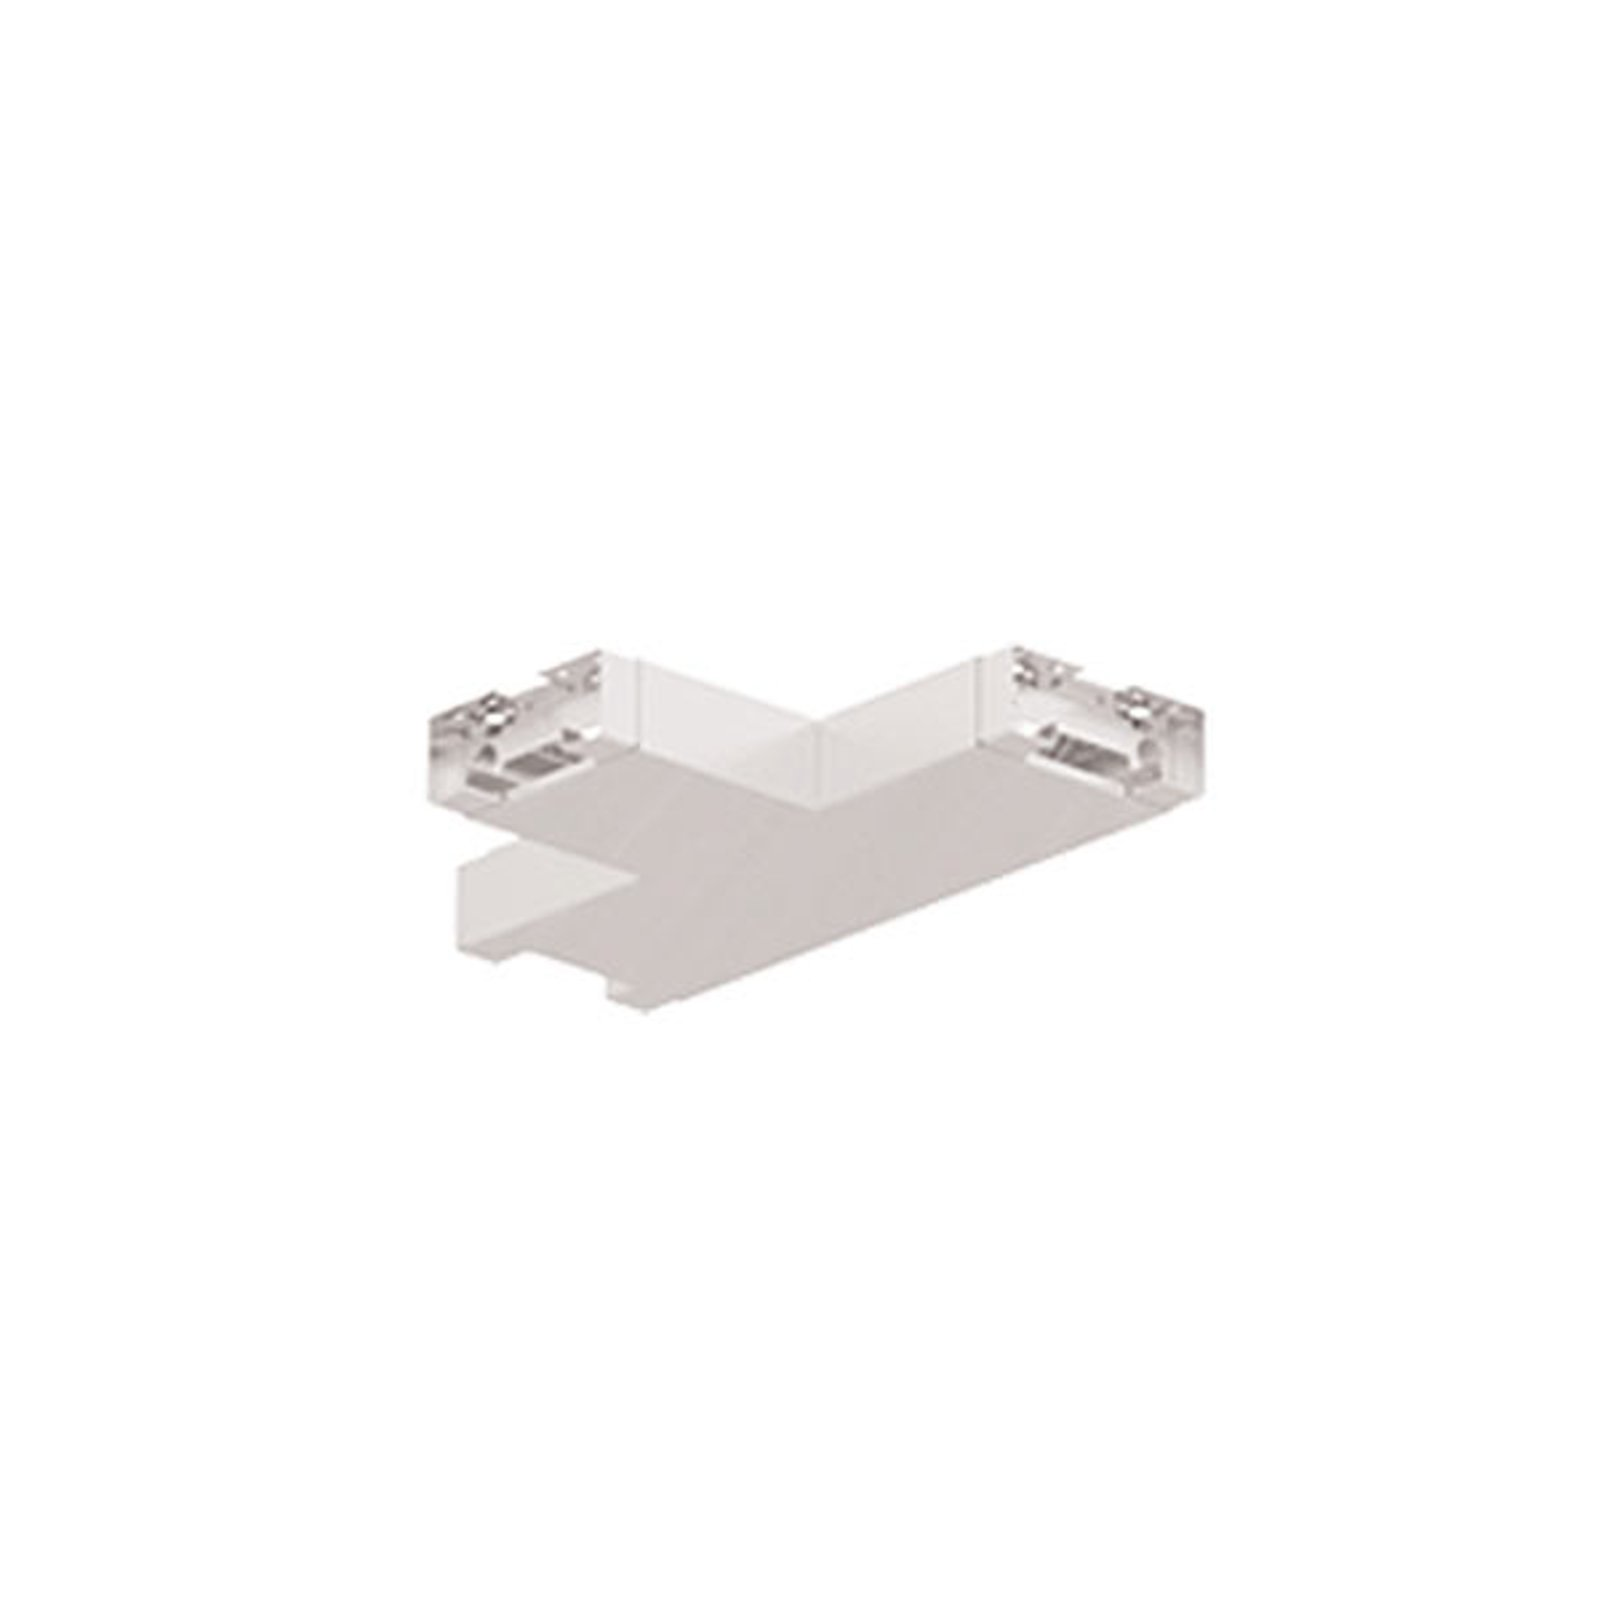 Forbinder Procube-CUVT-2 T90° for DL Procube